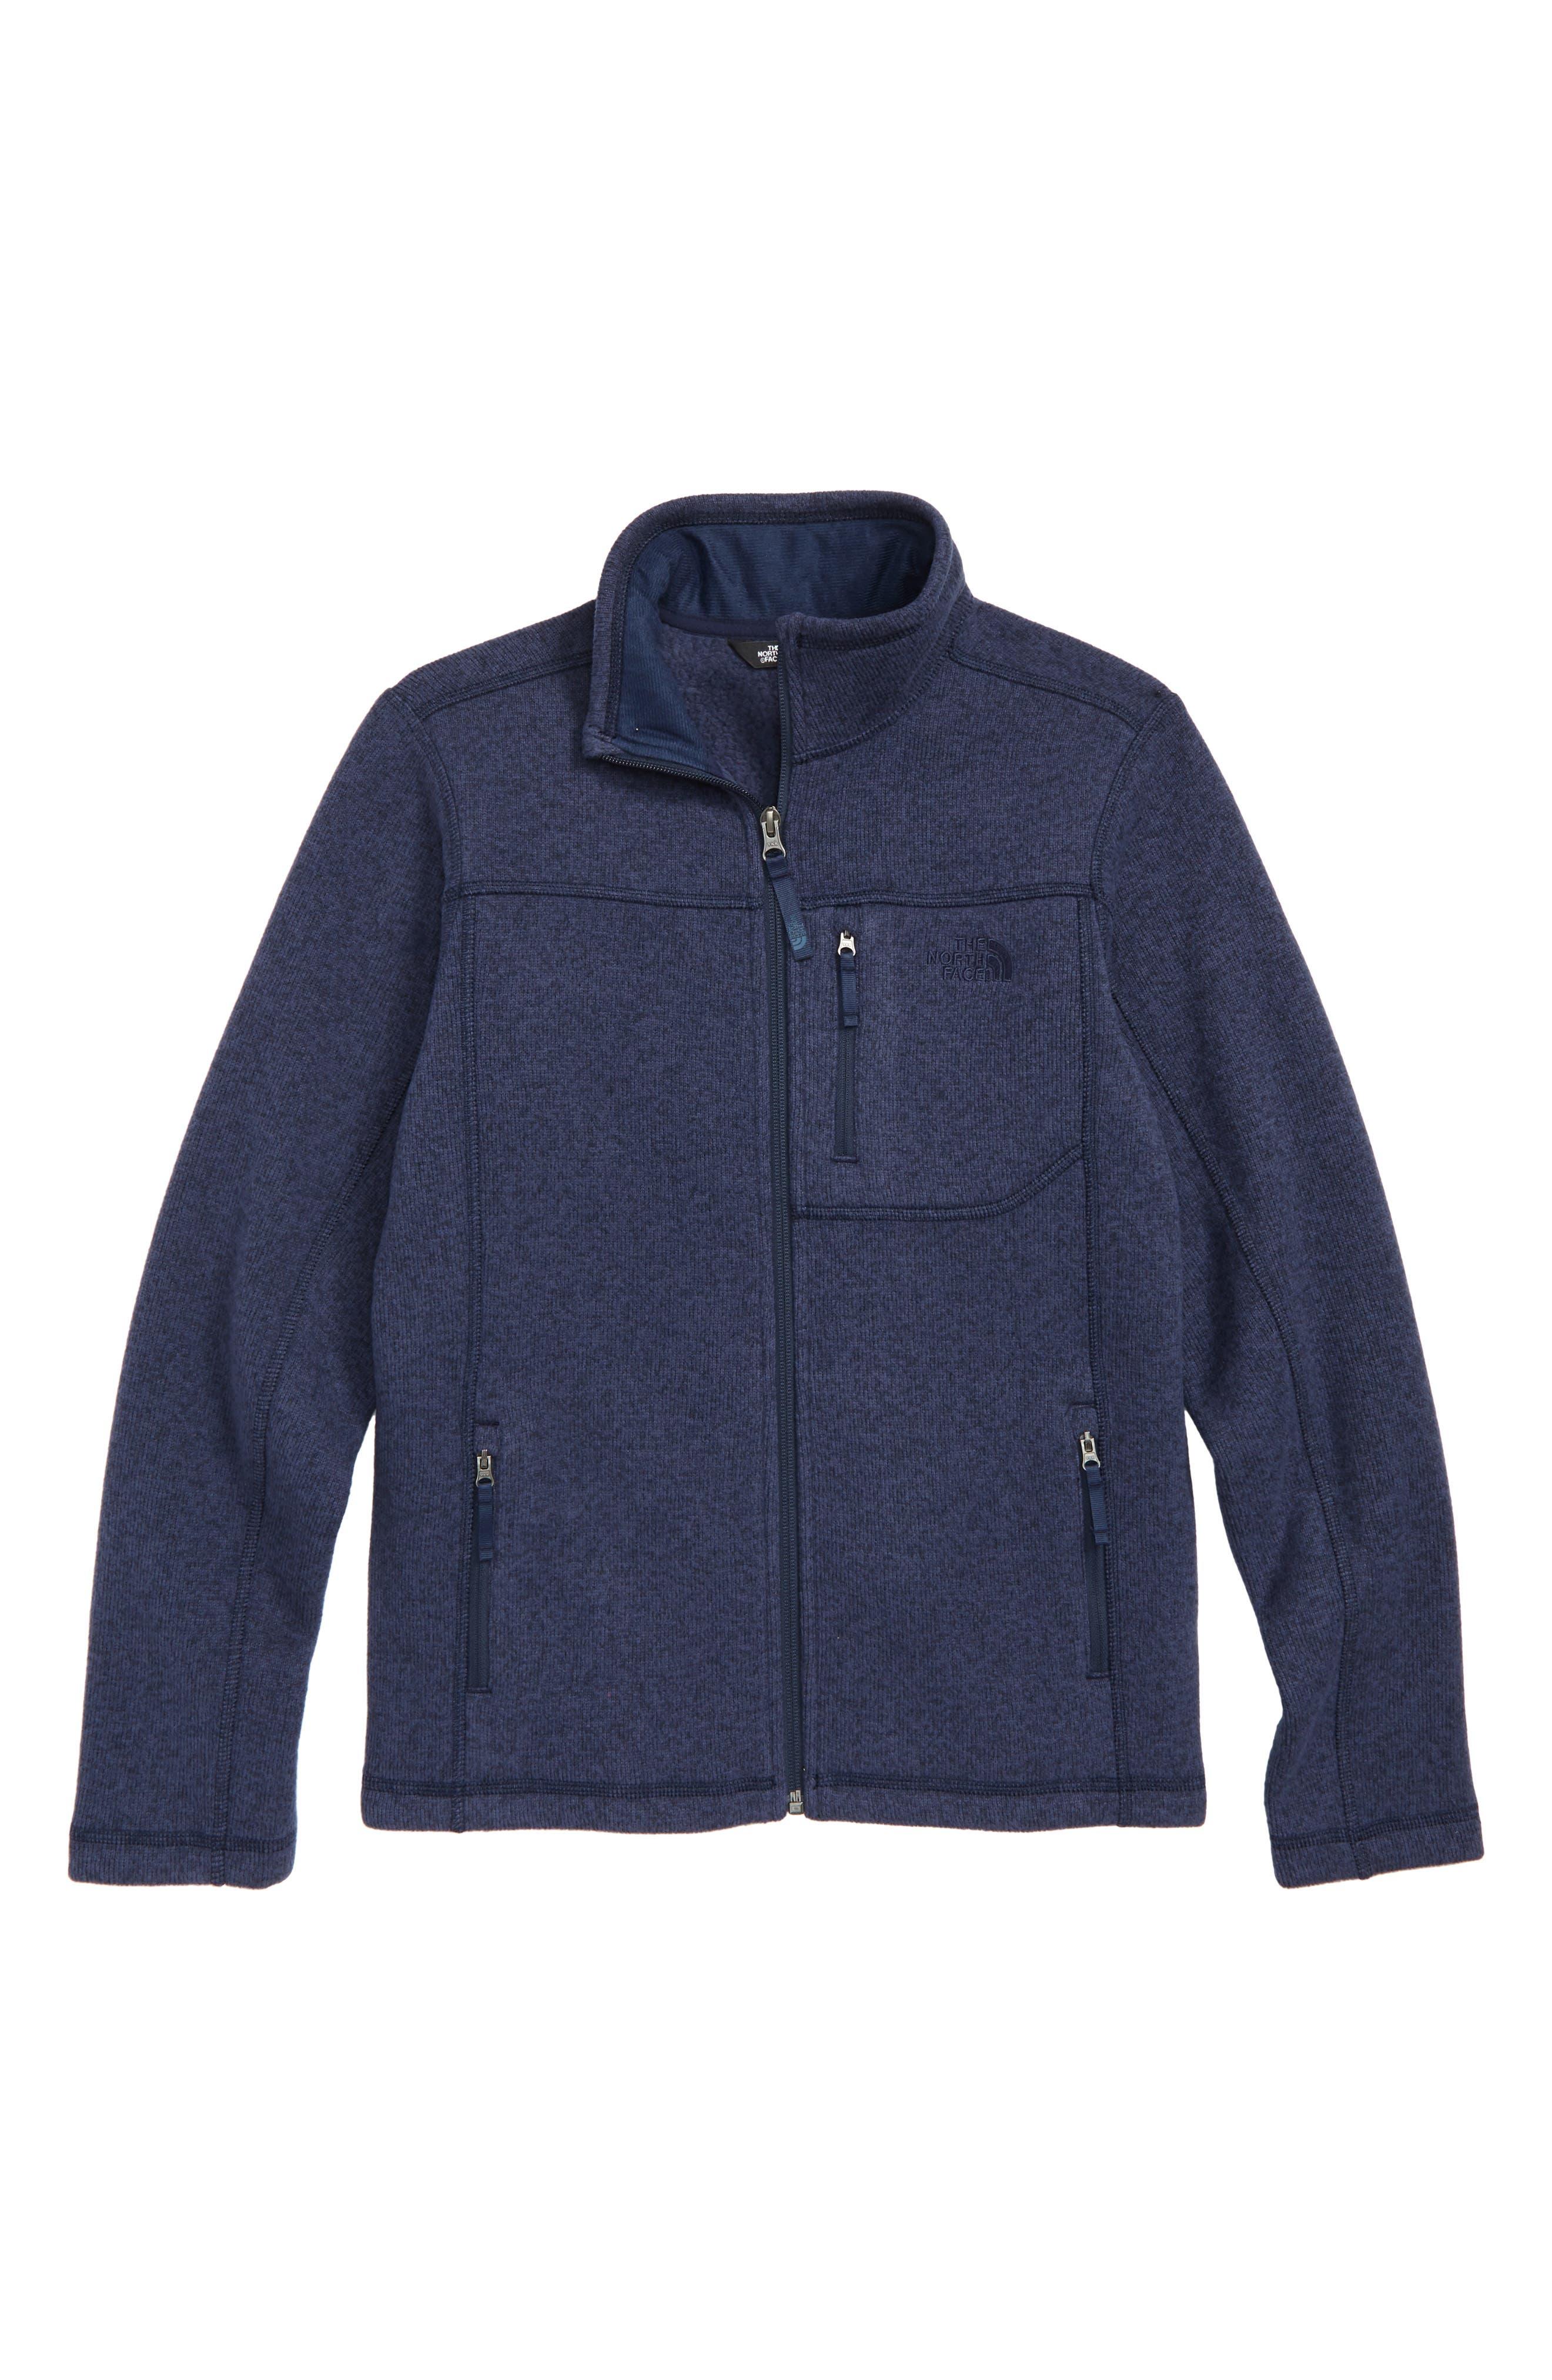 Gordon Lyons Sweater Fleece Zip Jacket,                             Main thumbnail 8, color,